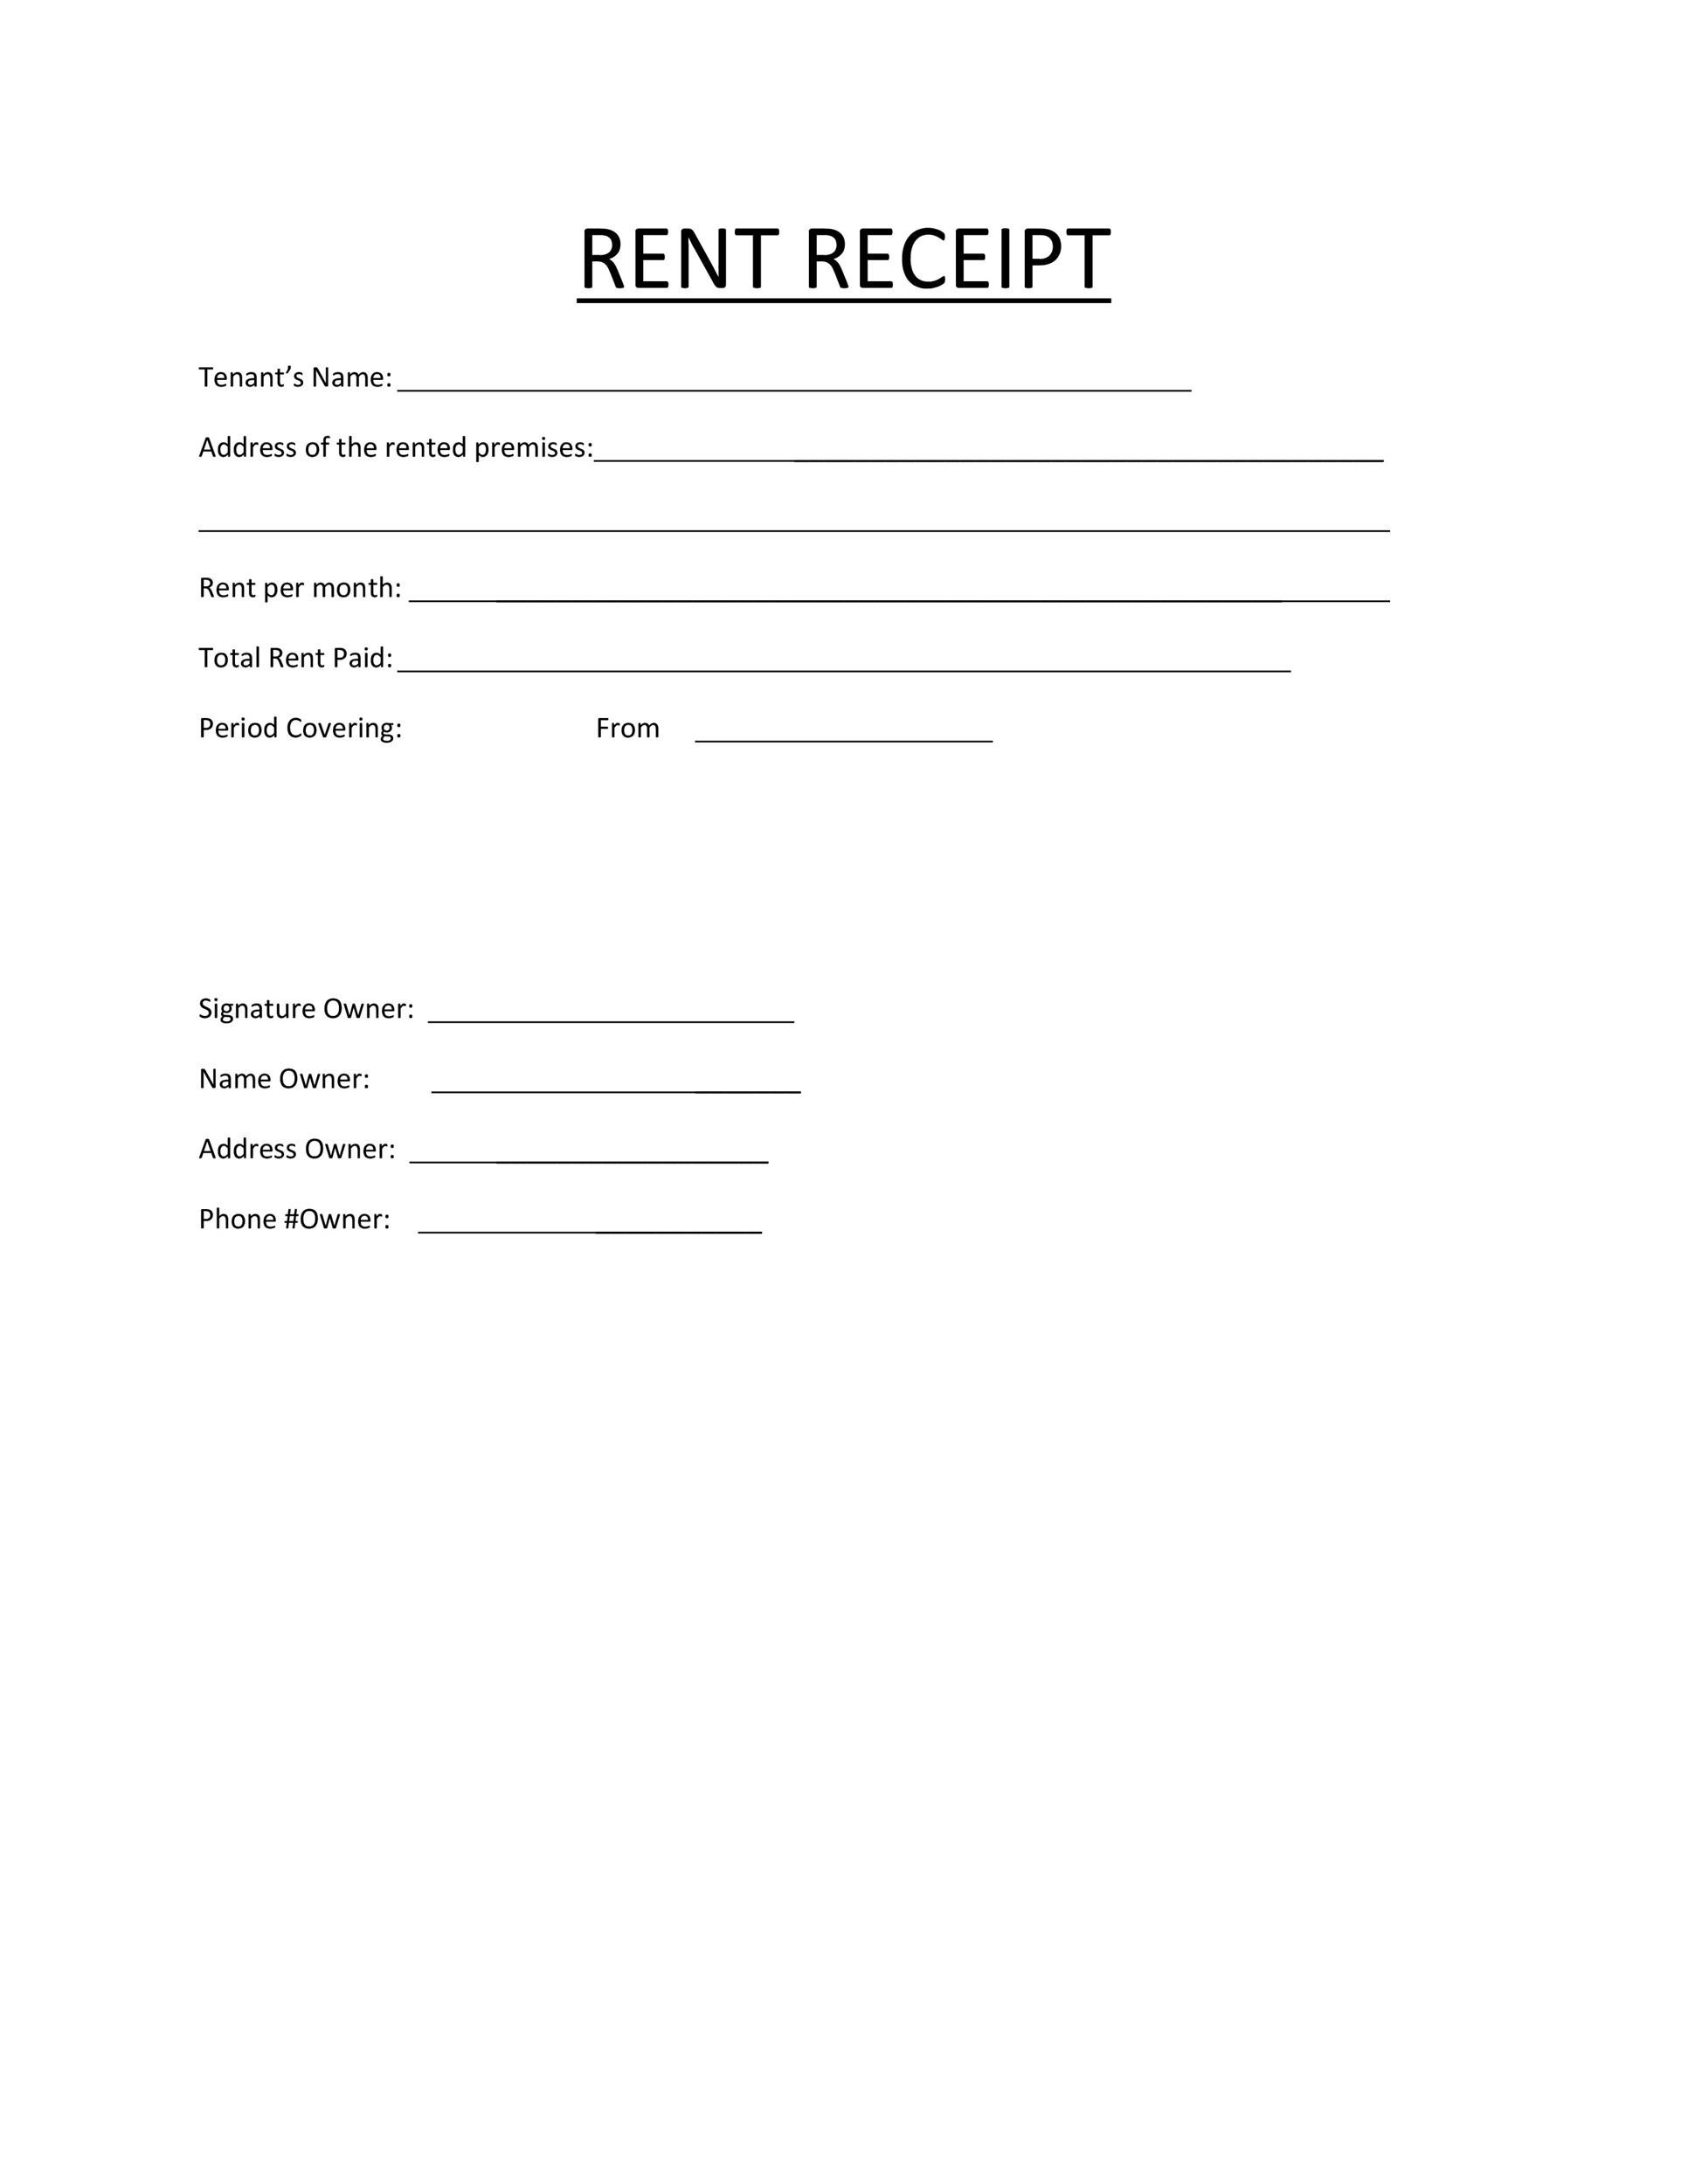 Free rent receipt 41